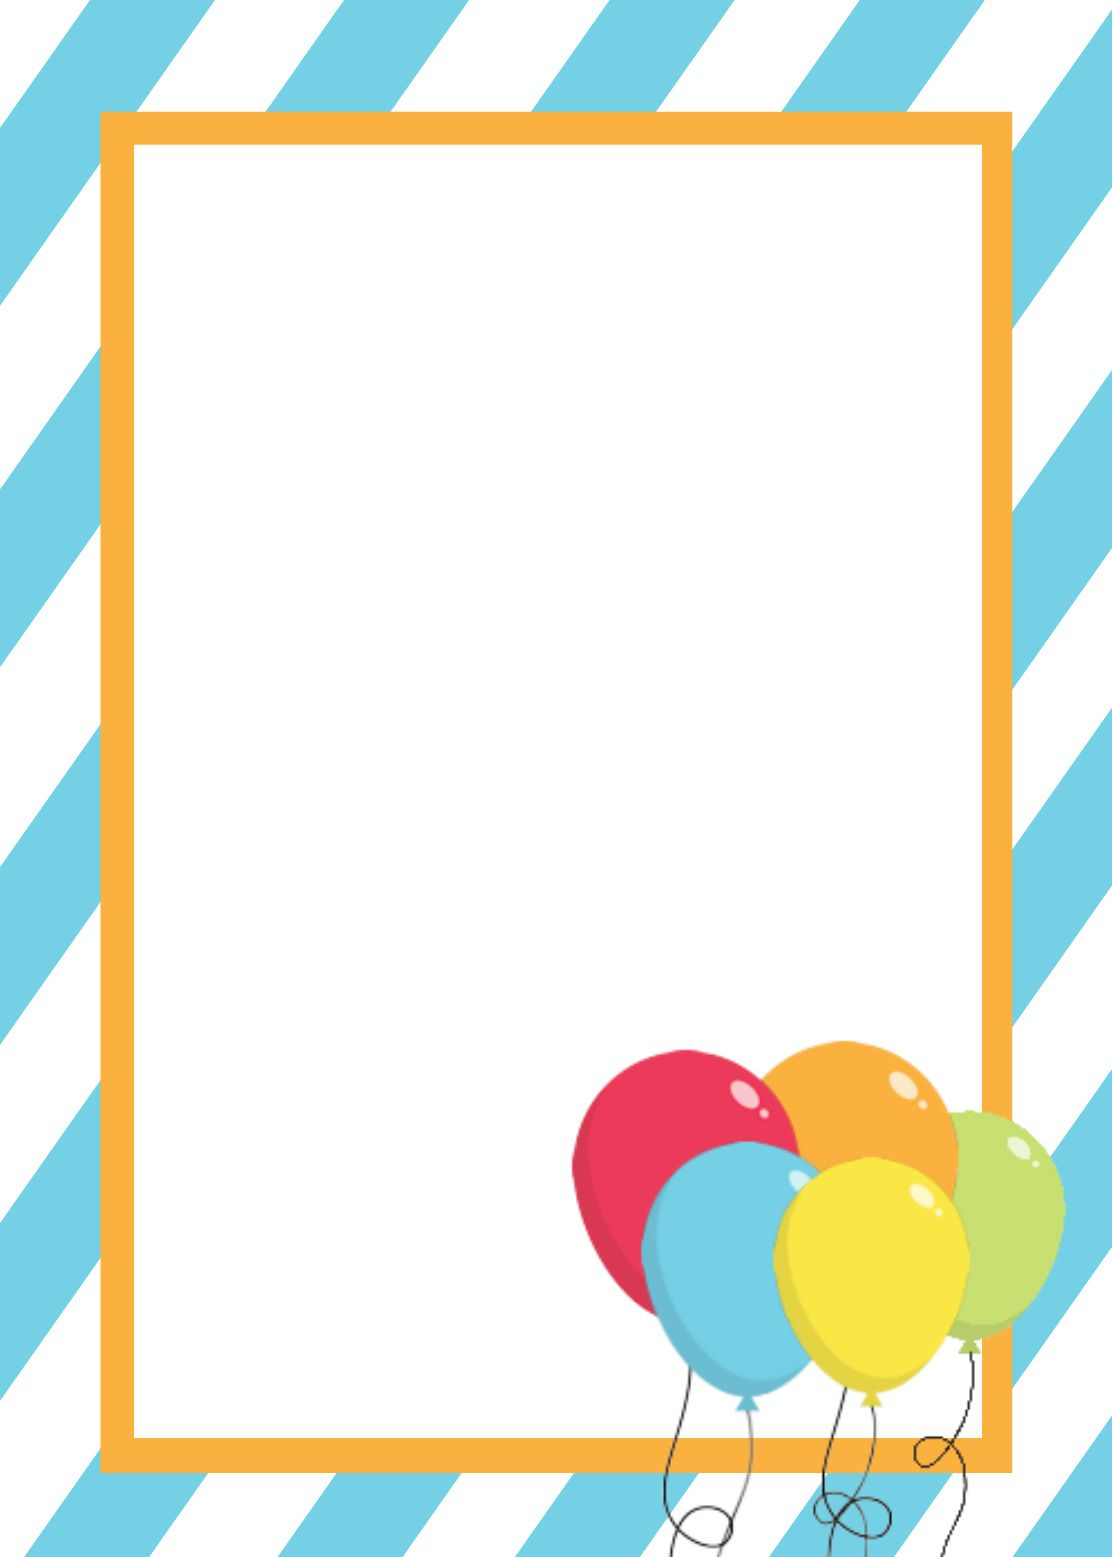 Free Printable Birthday Invitation Templates | Birthday Ideas And - Free Printable Birthday Invitation Cards